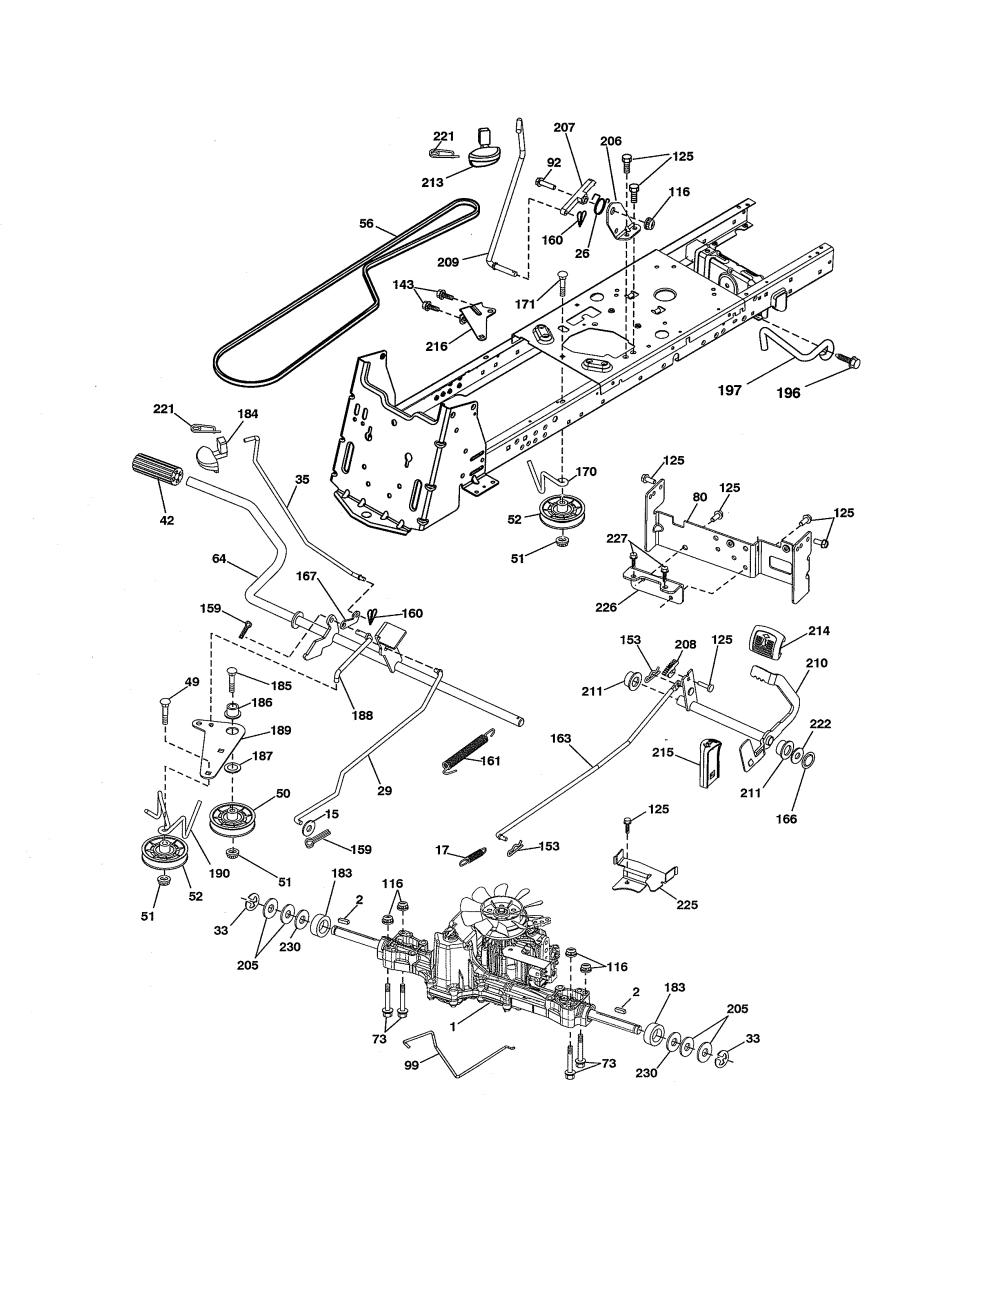 medium resolution of wiring diagram for craftsman 917 276922 riding lawn mower